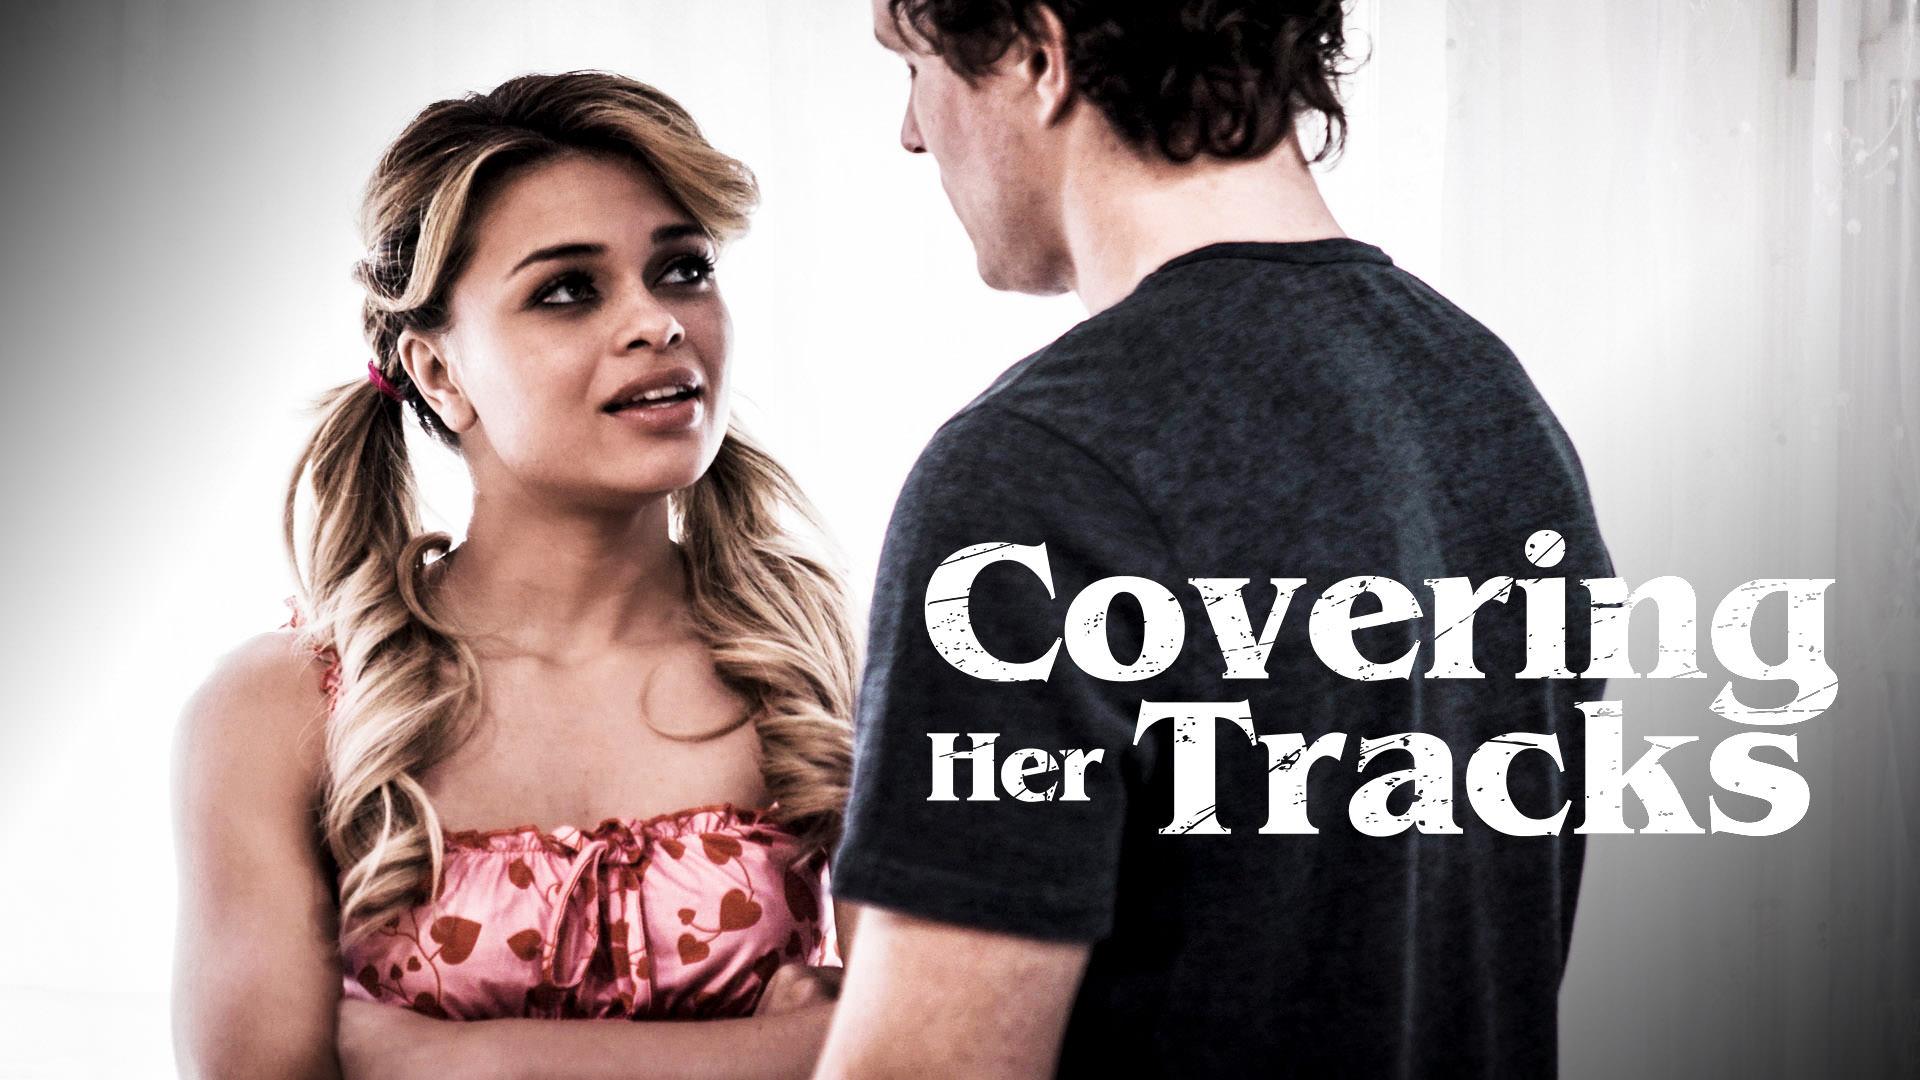 Covering Her Tracks, Scene #01